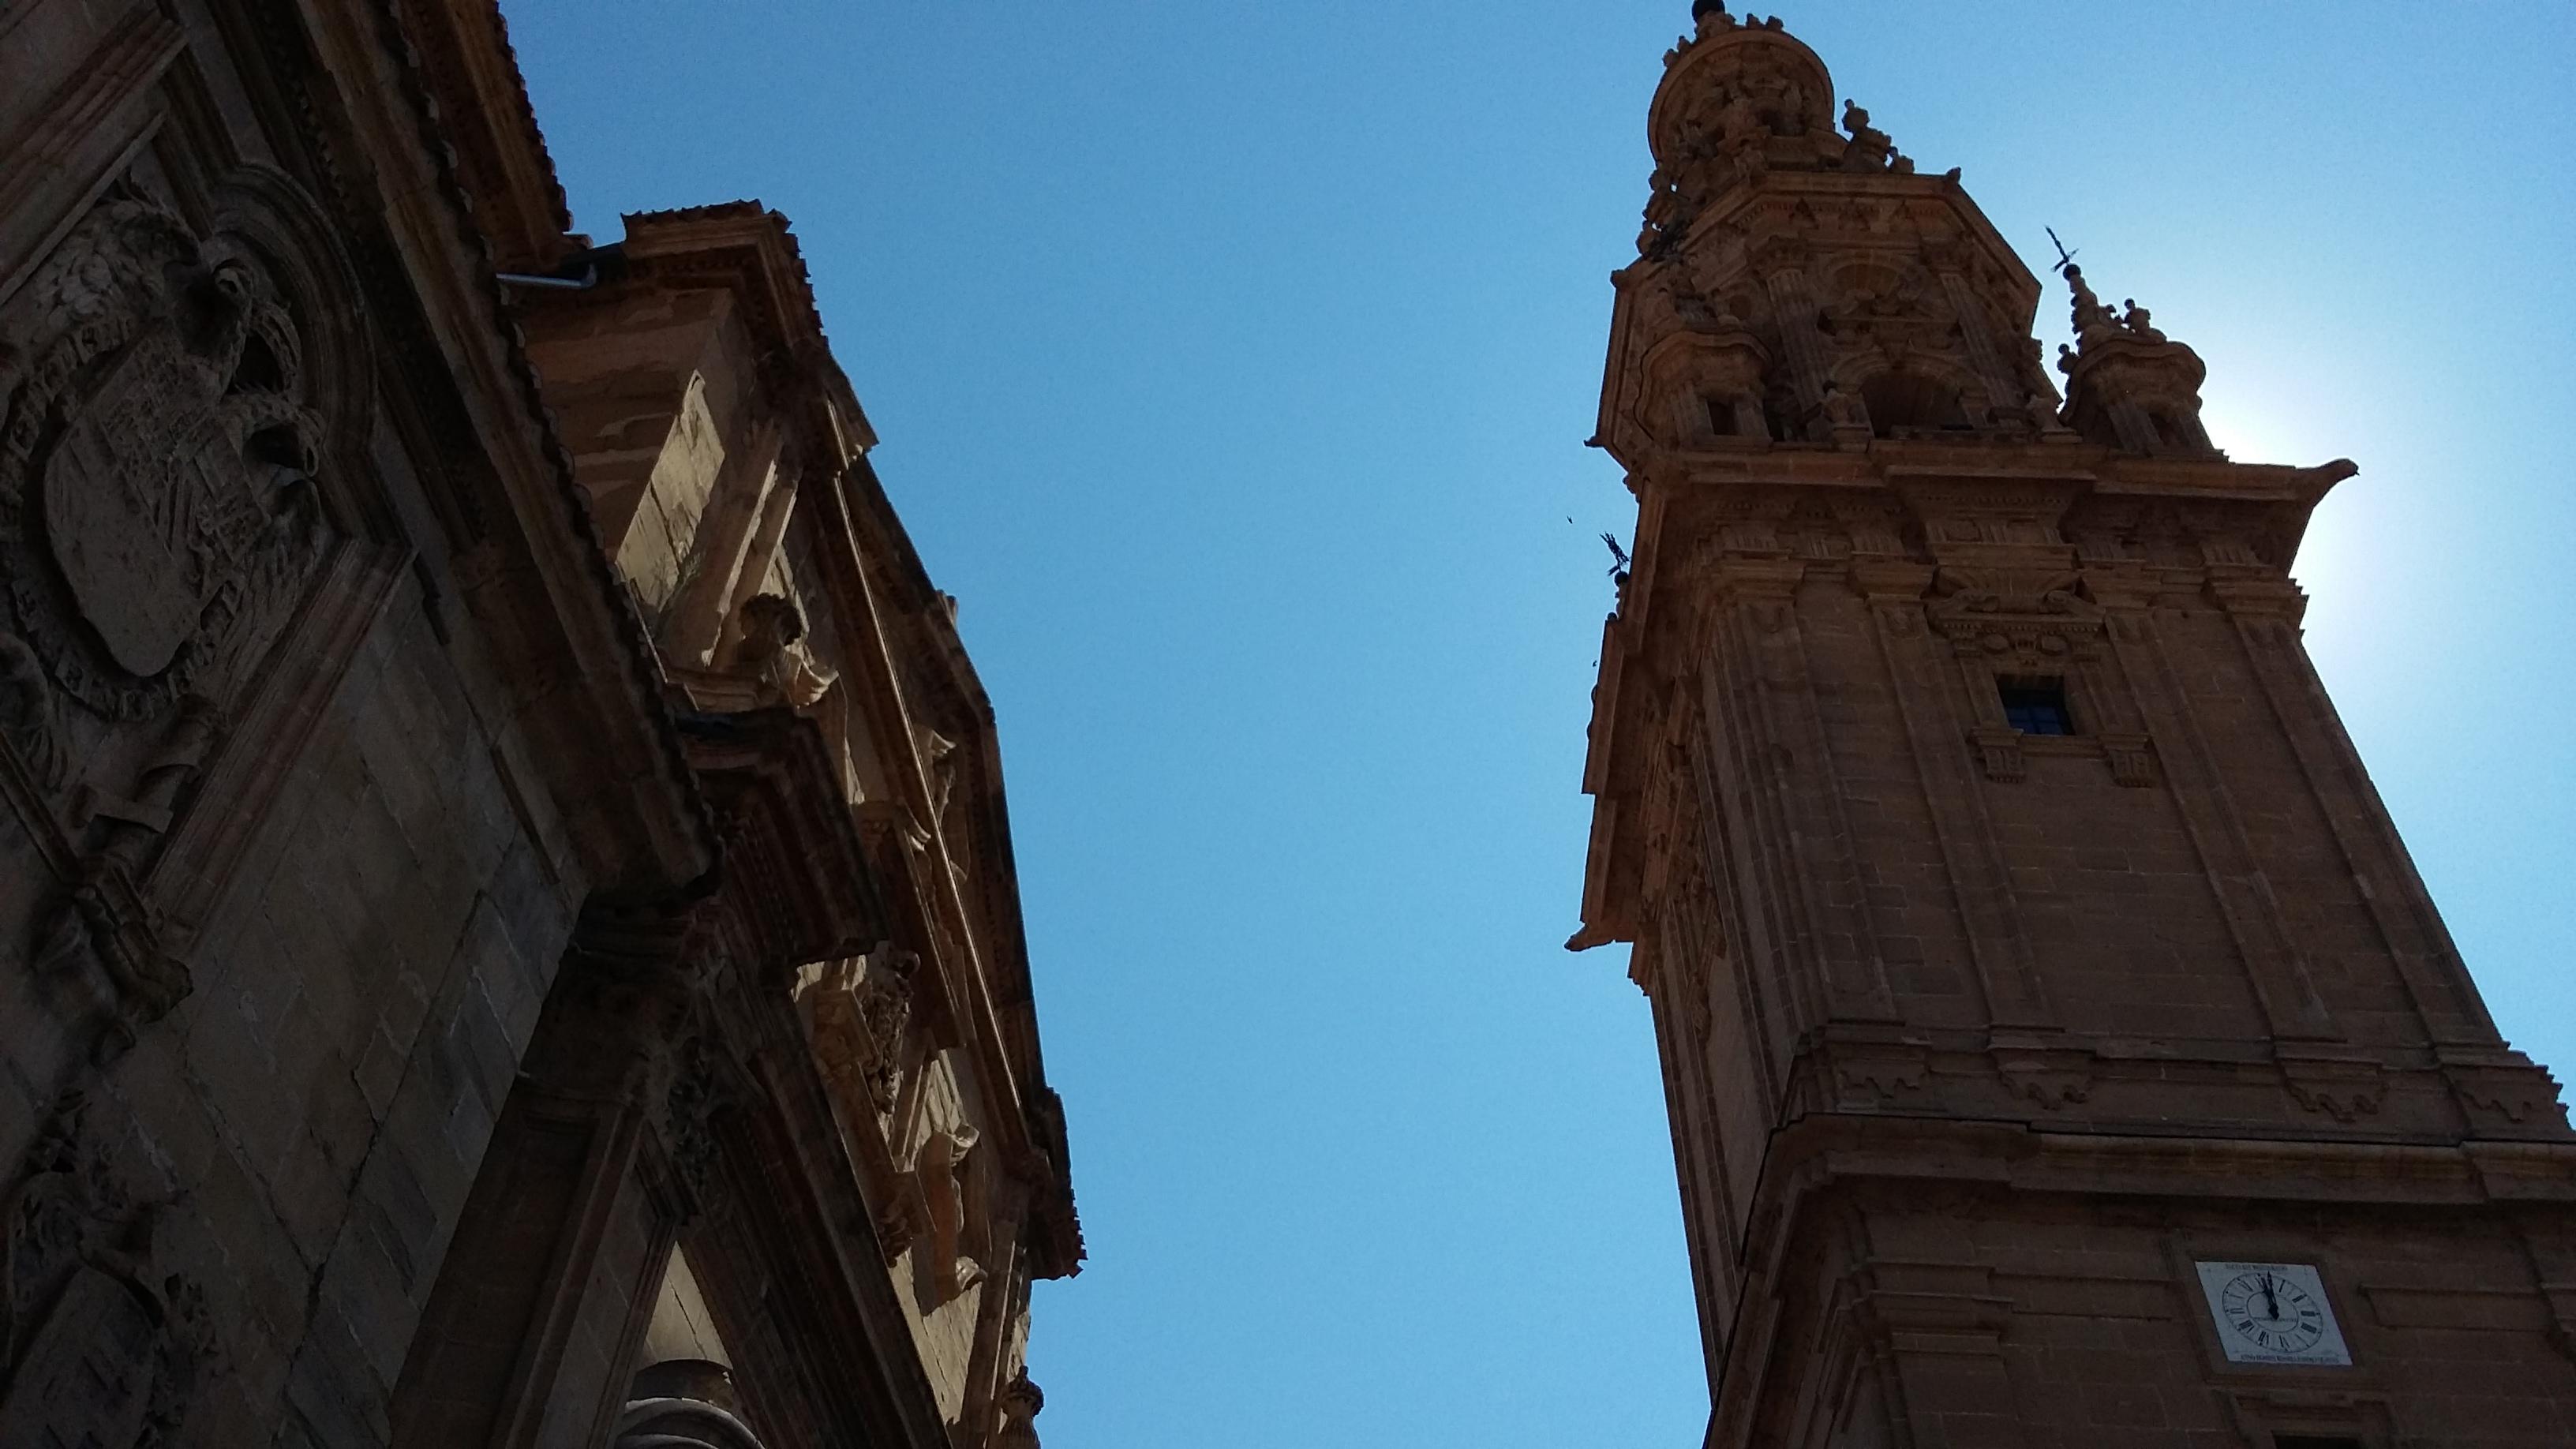 Catedral de Santa Domingo de la Calzada